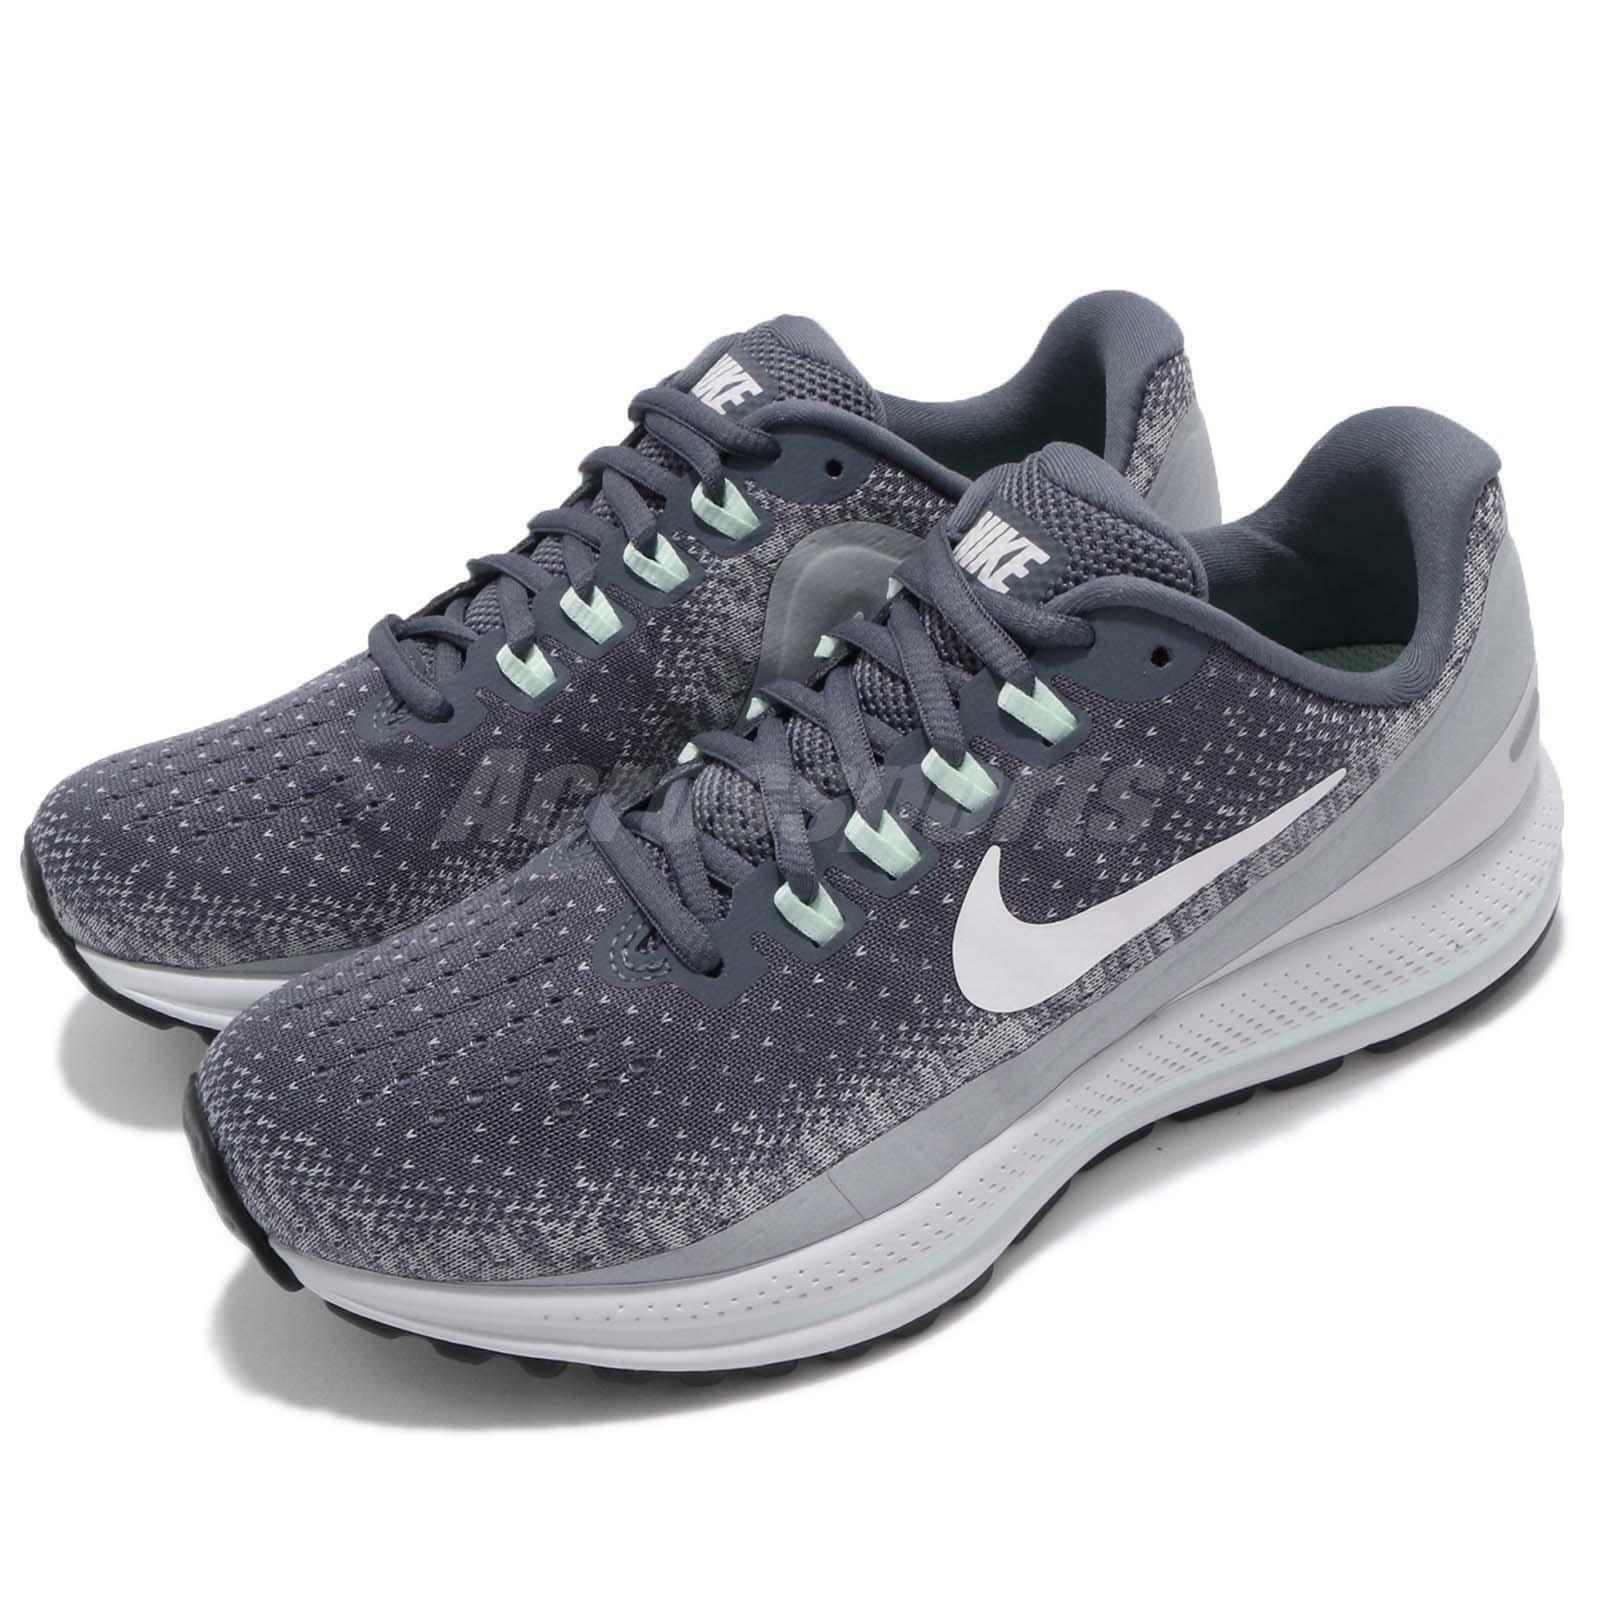 Wmns Nike Air Zoom Vomero 13 XIII Light Carbon bianca bianca bianca donna Running 922909-002 346429